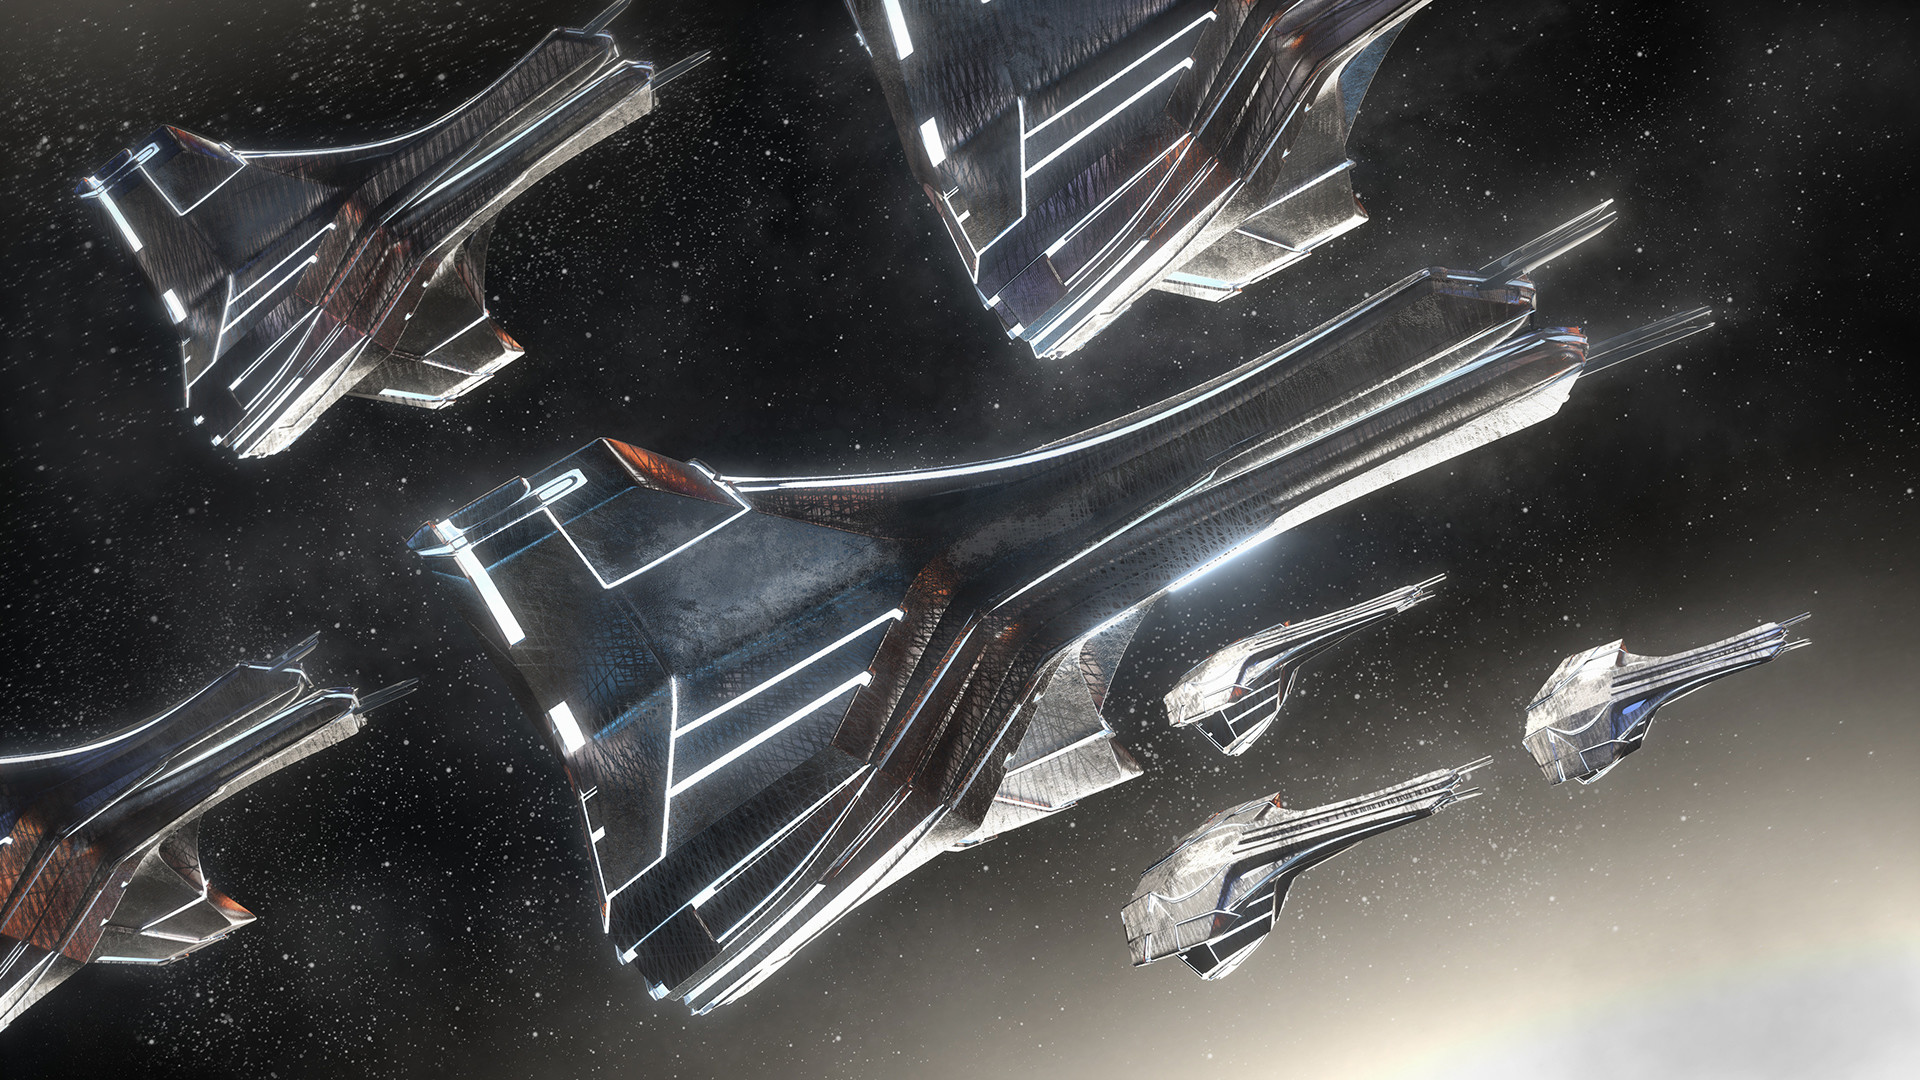 Kresimir jelusic 138 240216 spaceship2